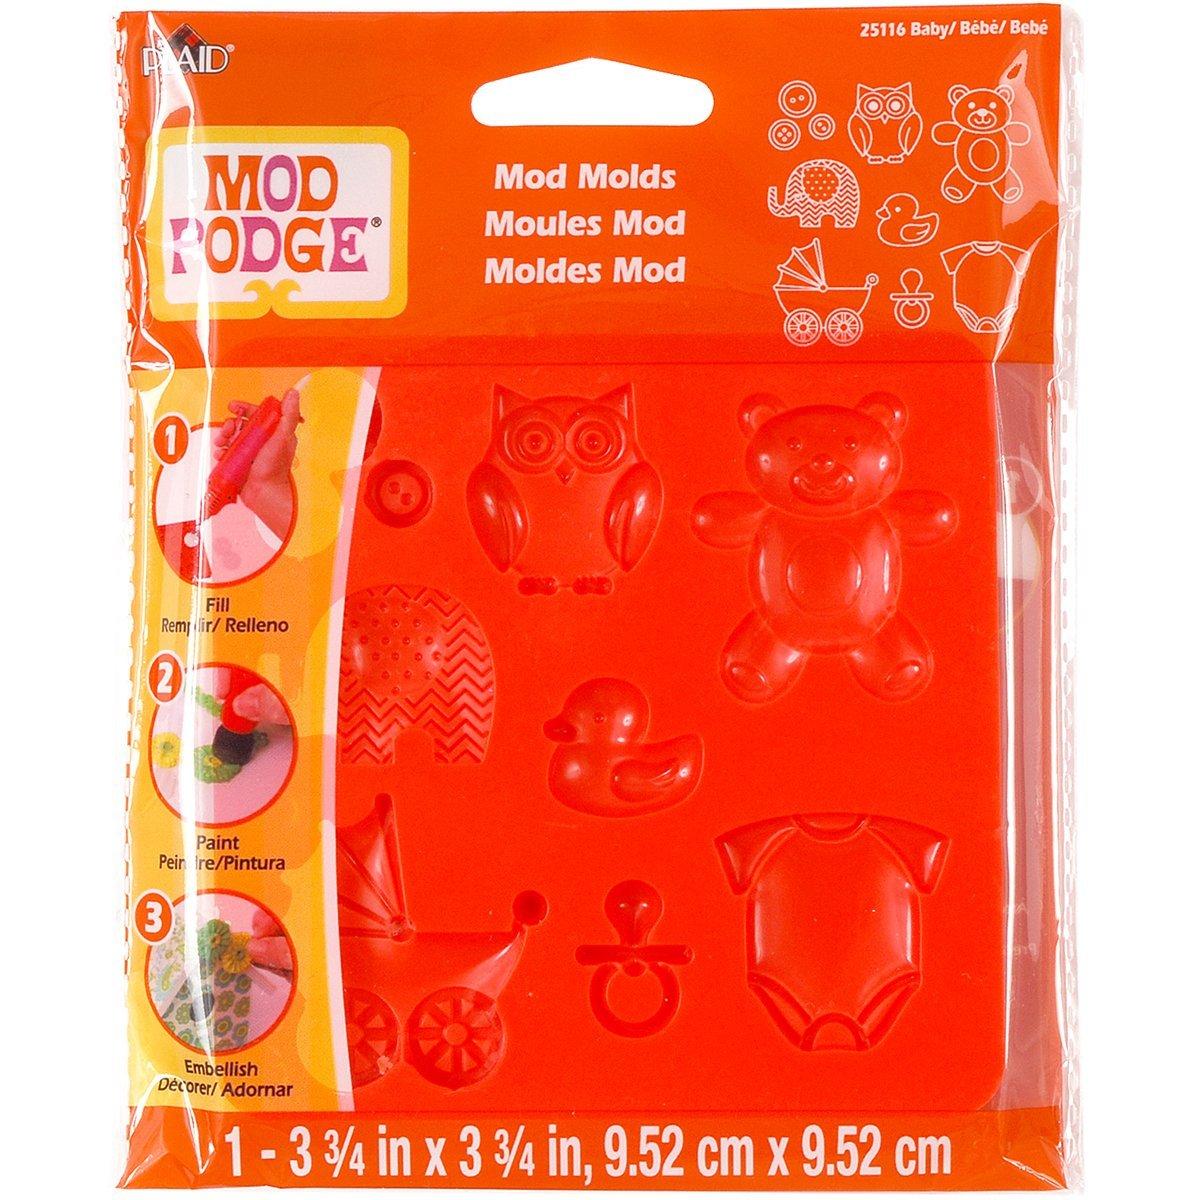 Mod Podge ® Mod Molds - Baby